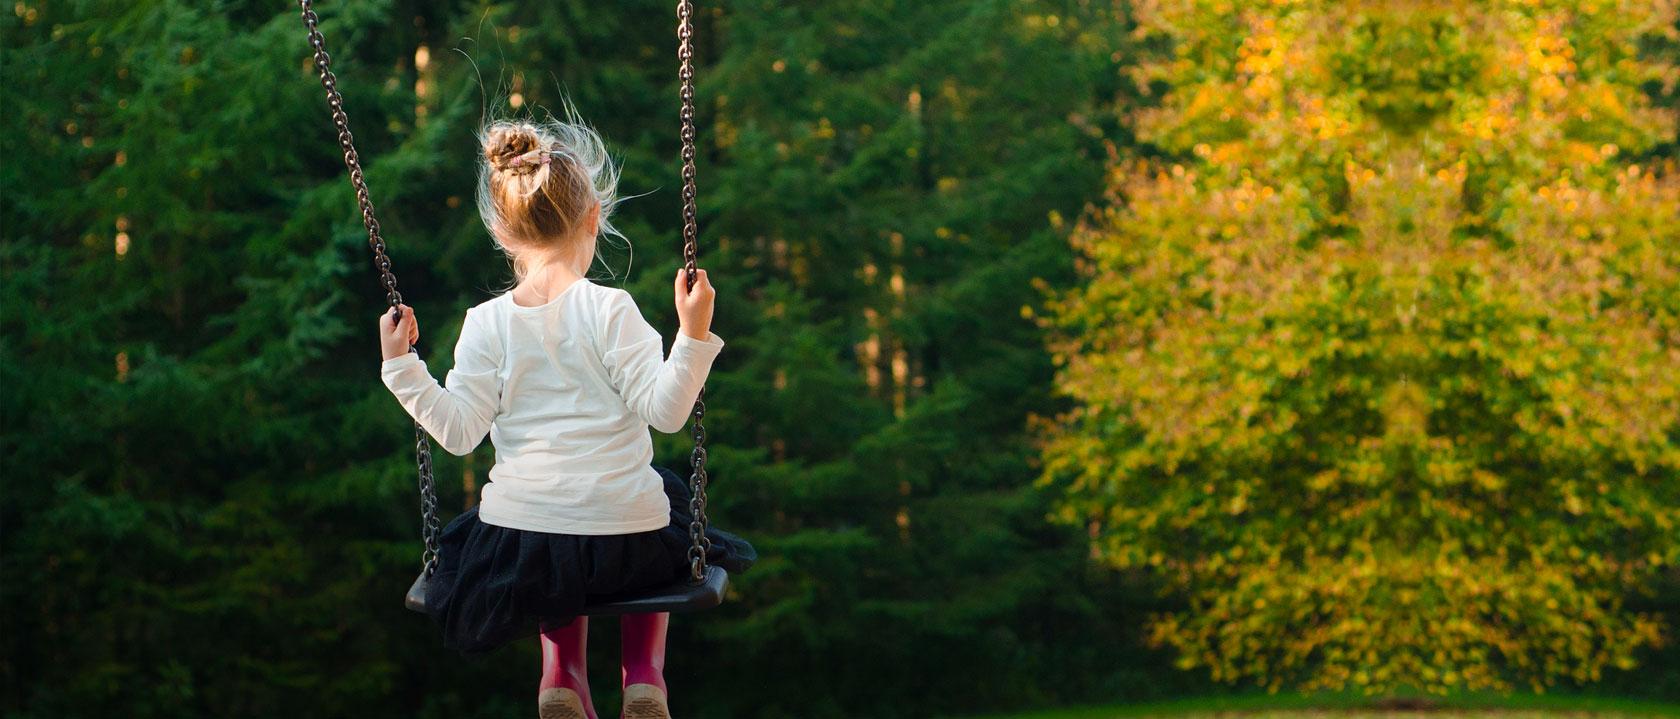 A girl enjoying playground equipment